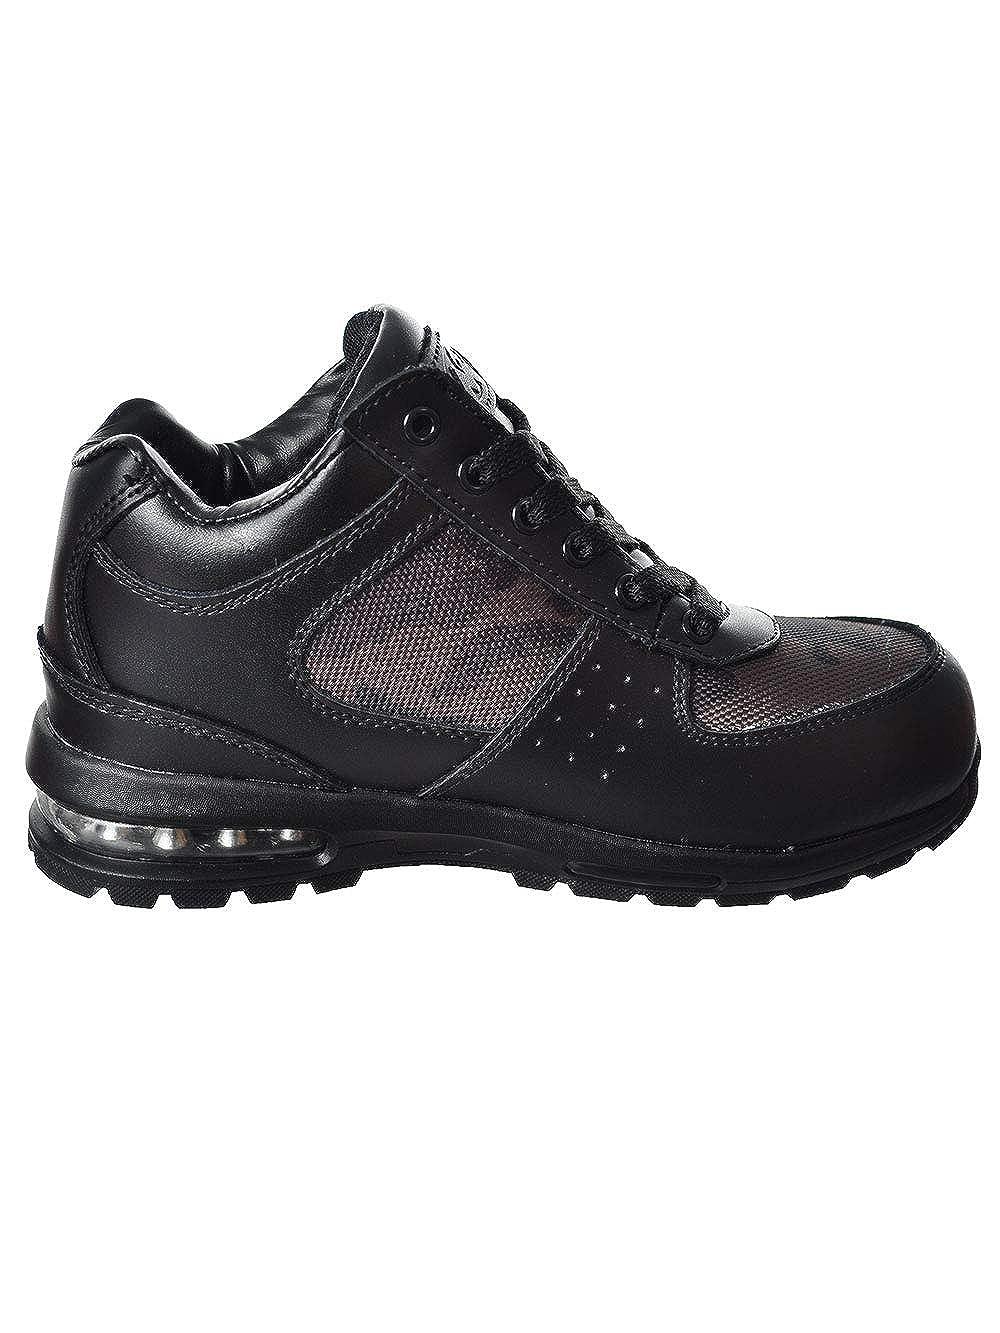 Black camo 5 Youth Mountain Gear Boys Boots